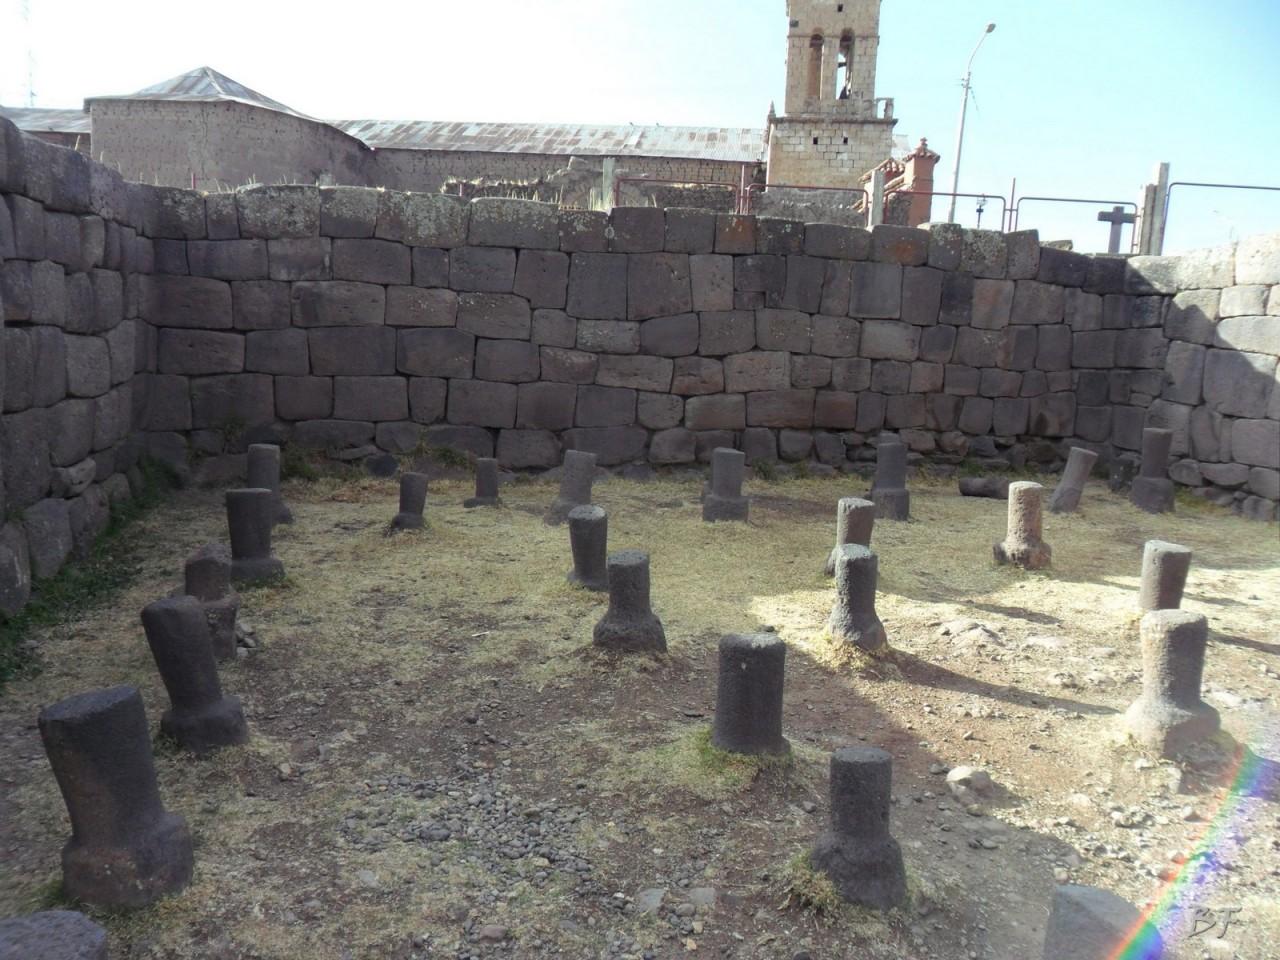 Mura-Poligonali-Megaliti-Inca-Uyo-Puno-Perù-1